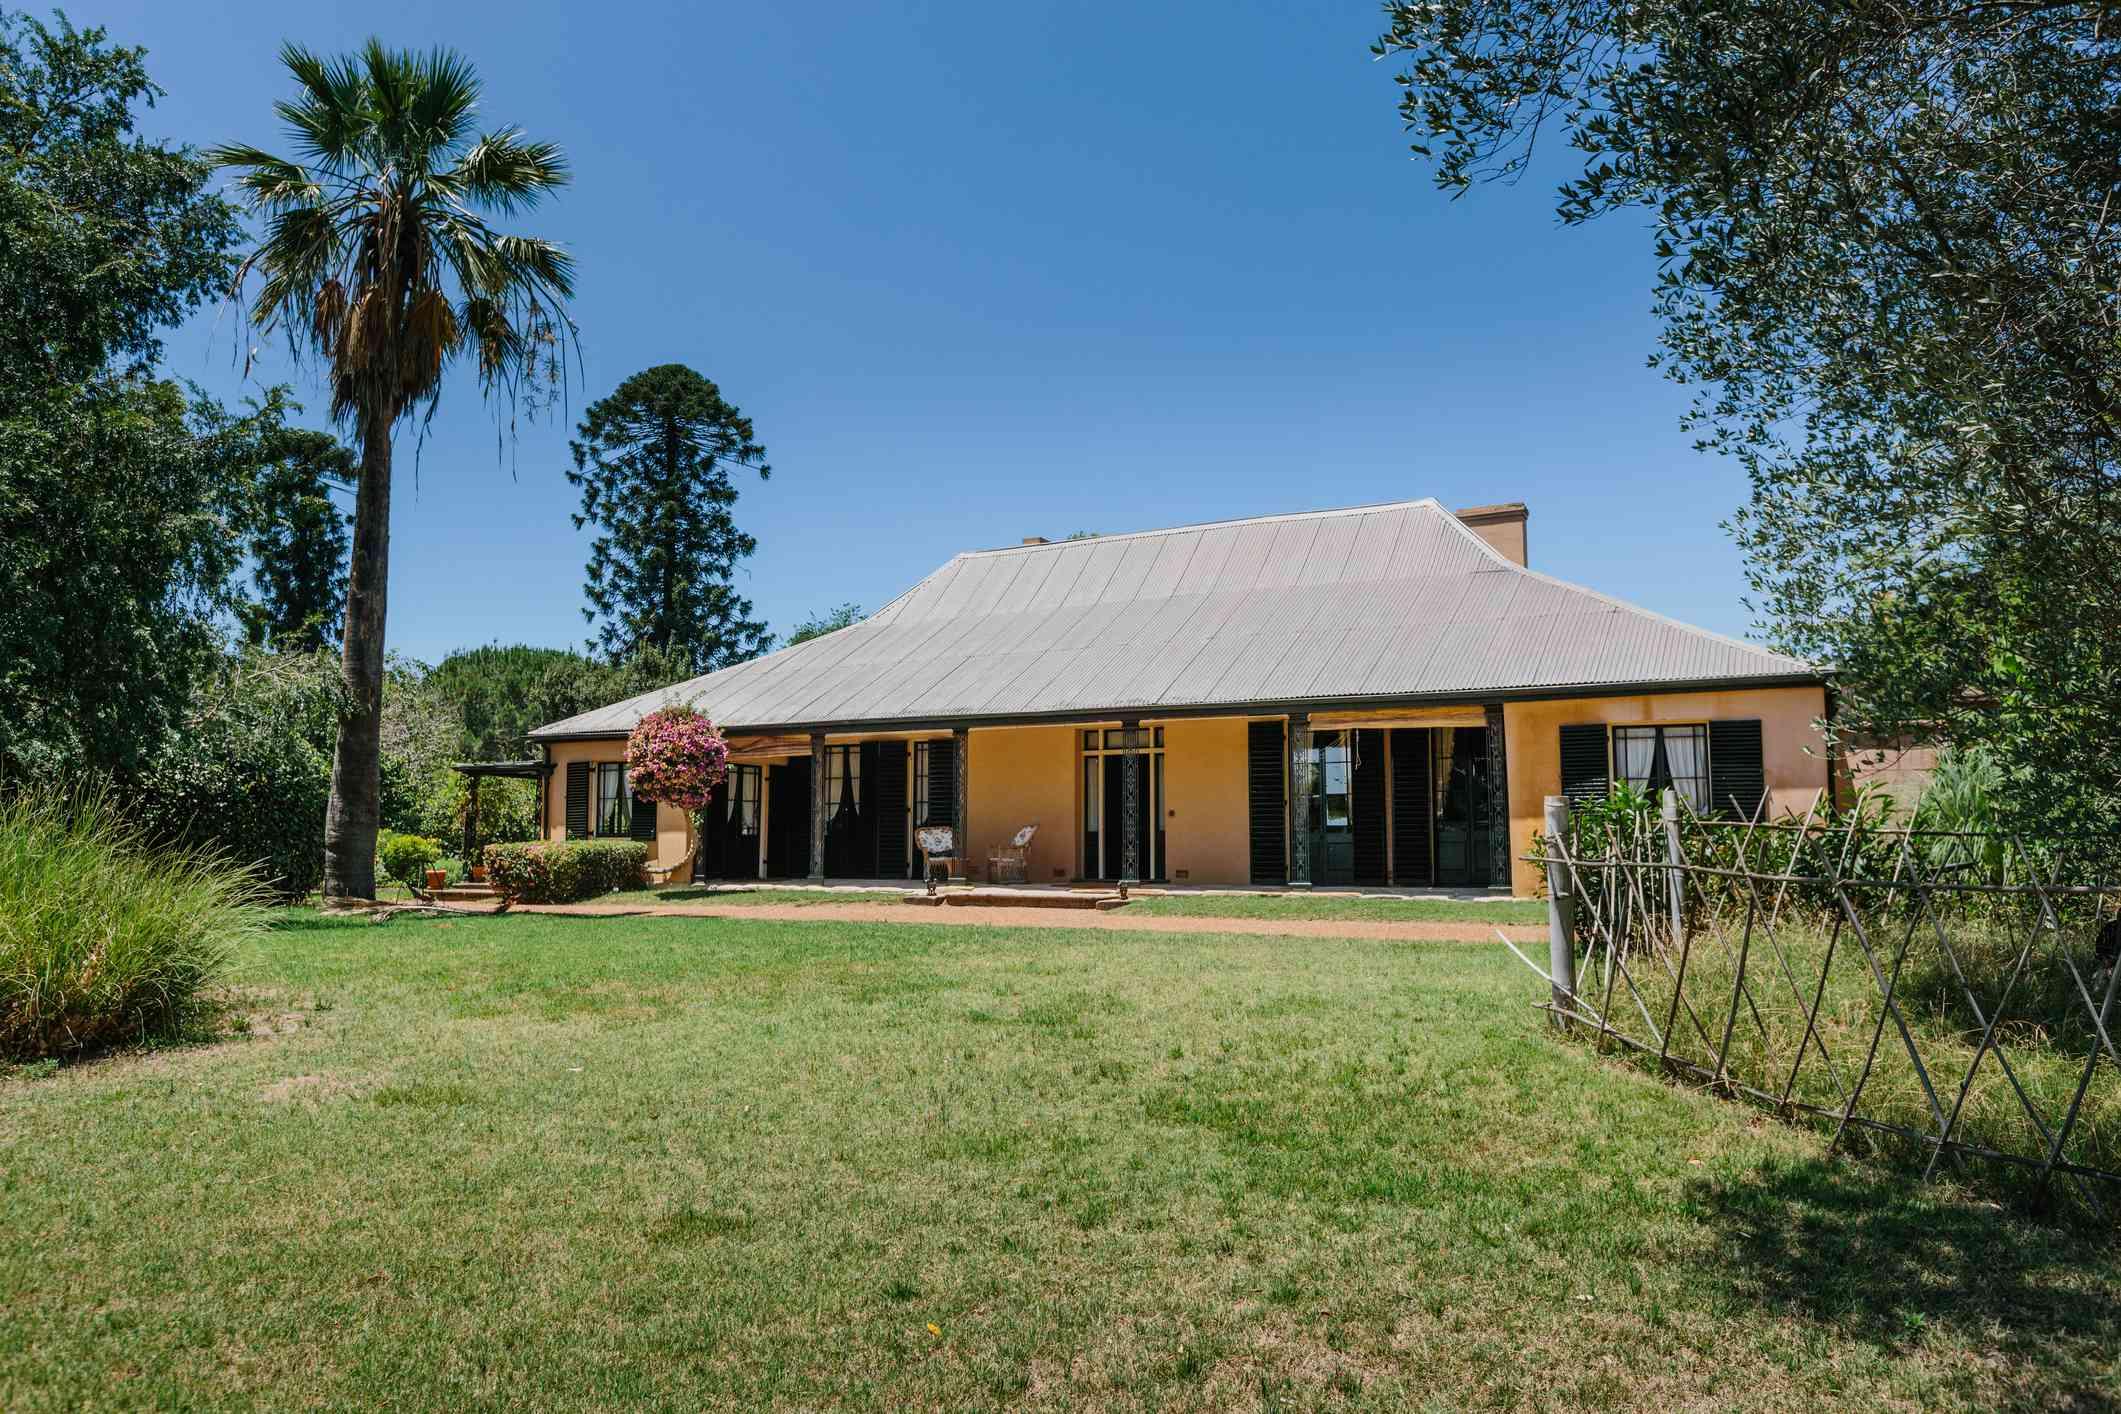 Exterior Photo of Elizabeth Farm Historical Homestead, Parramatta, Sydney, Australia